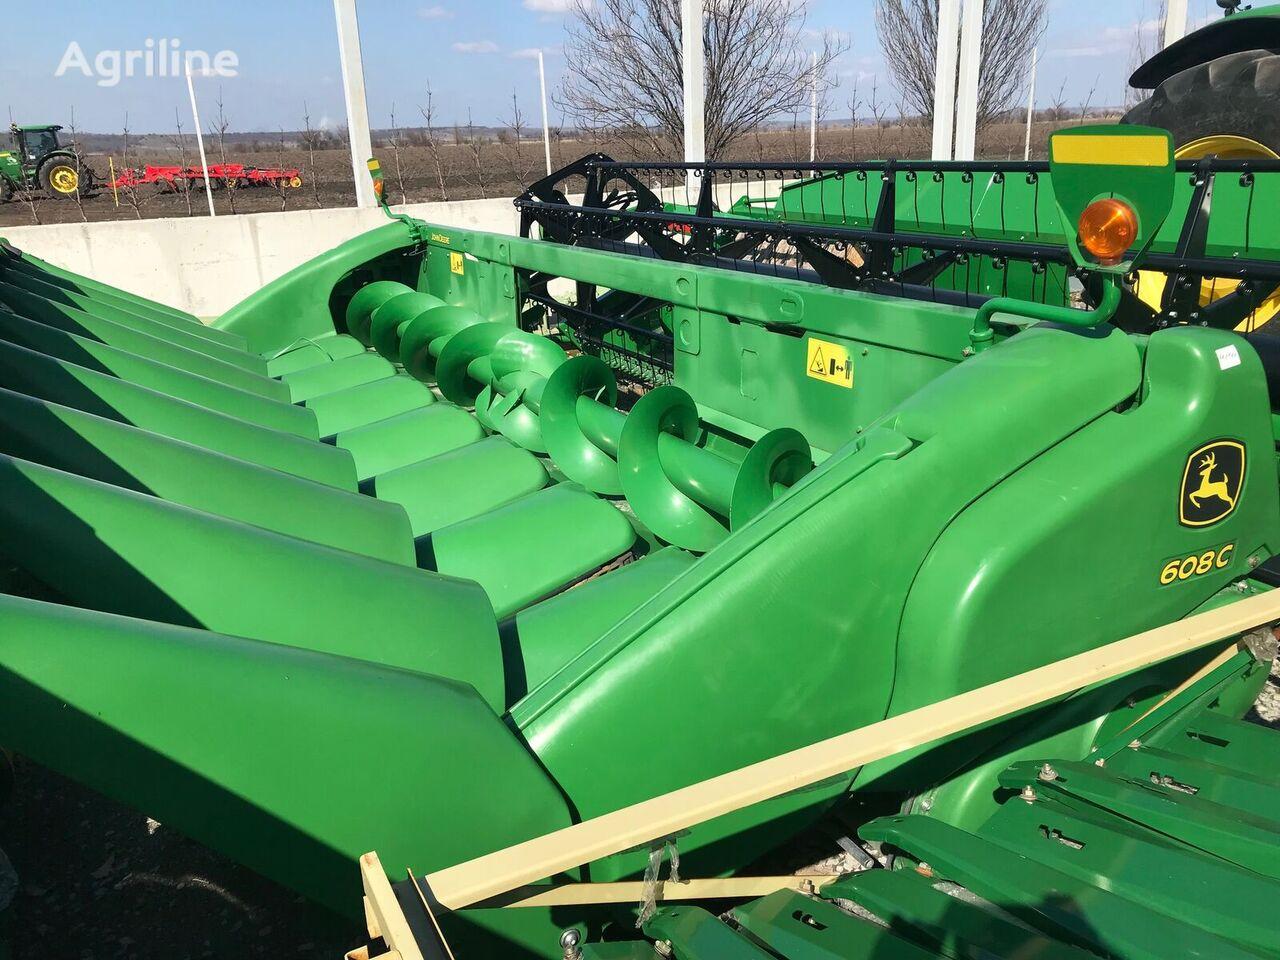 novi JOHN DEERE 608C adapter za kukuruz